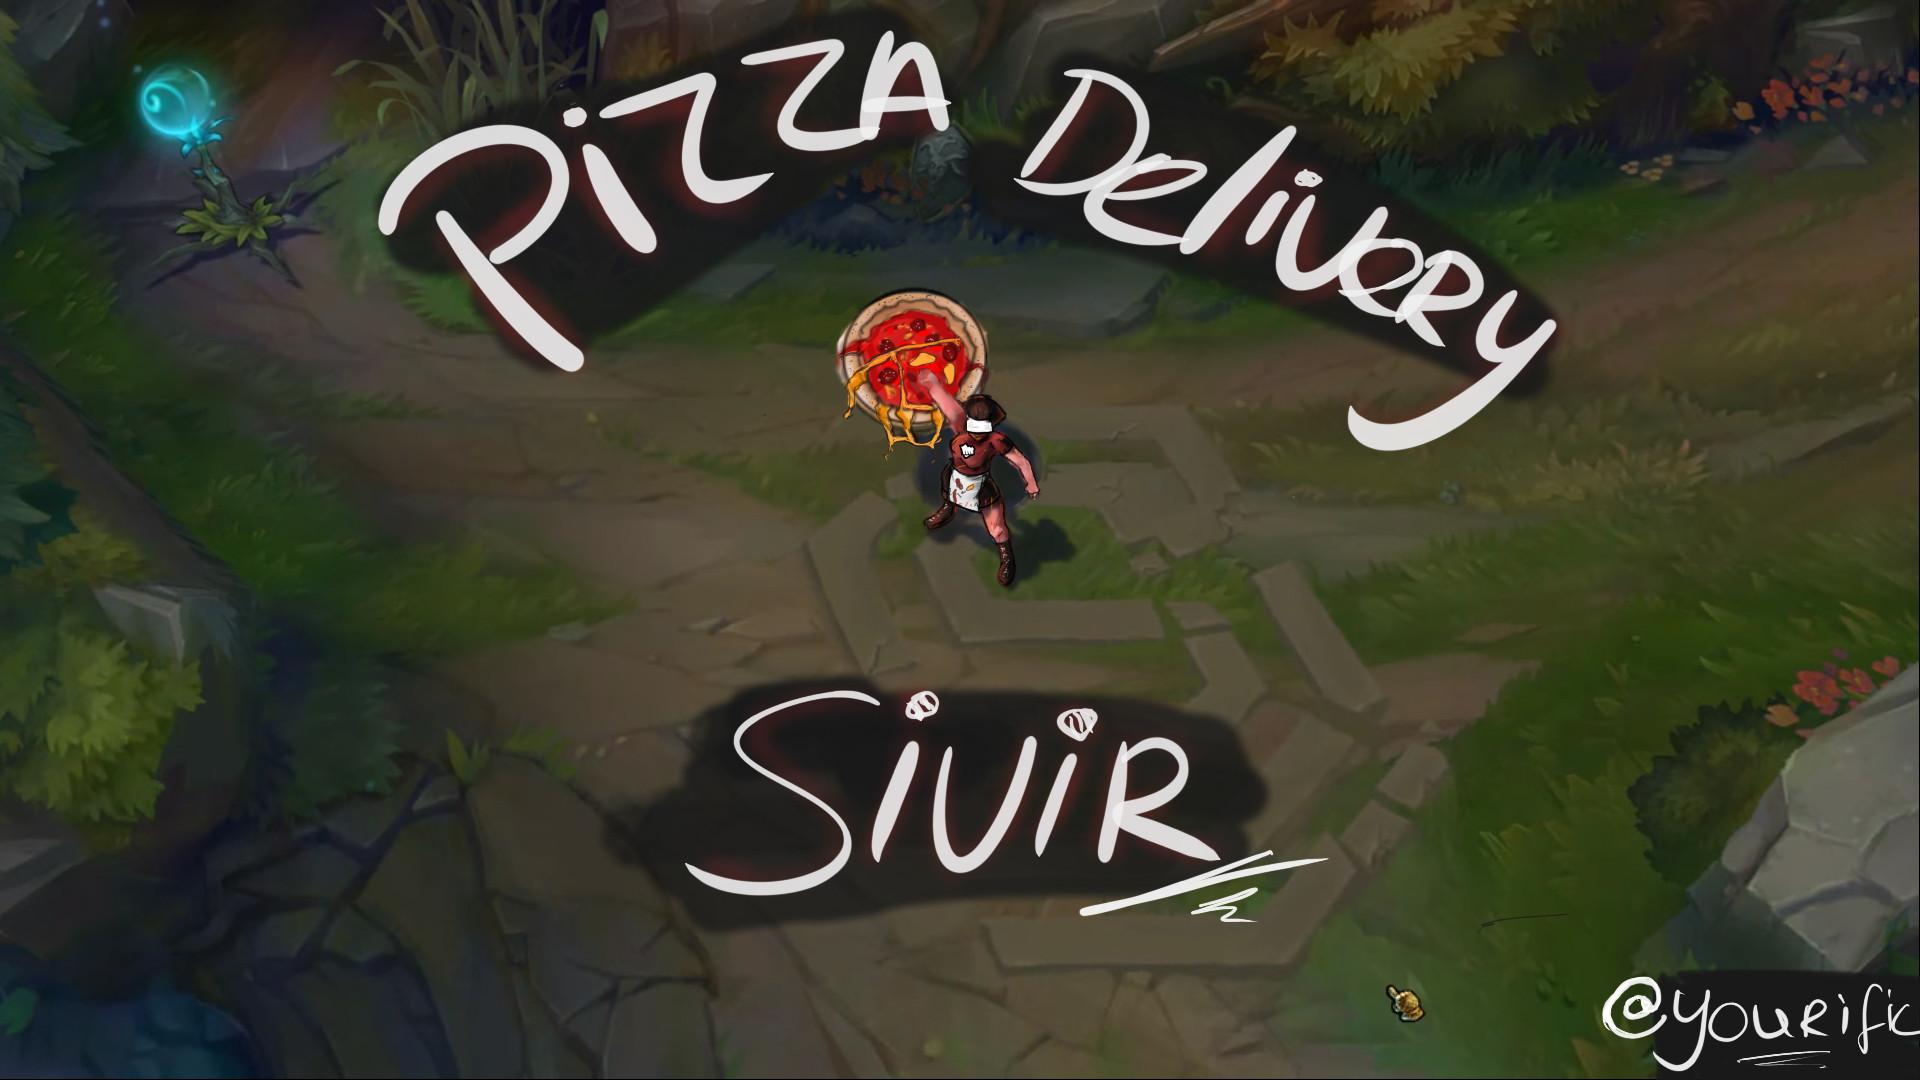 Artstation Pizza Delivery Sivir Youri Hogeboom